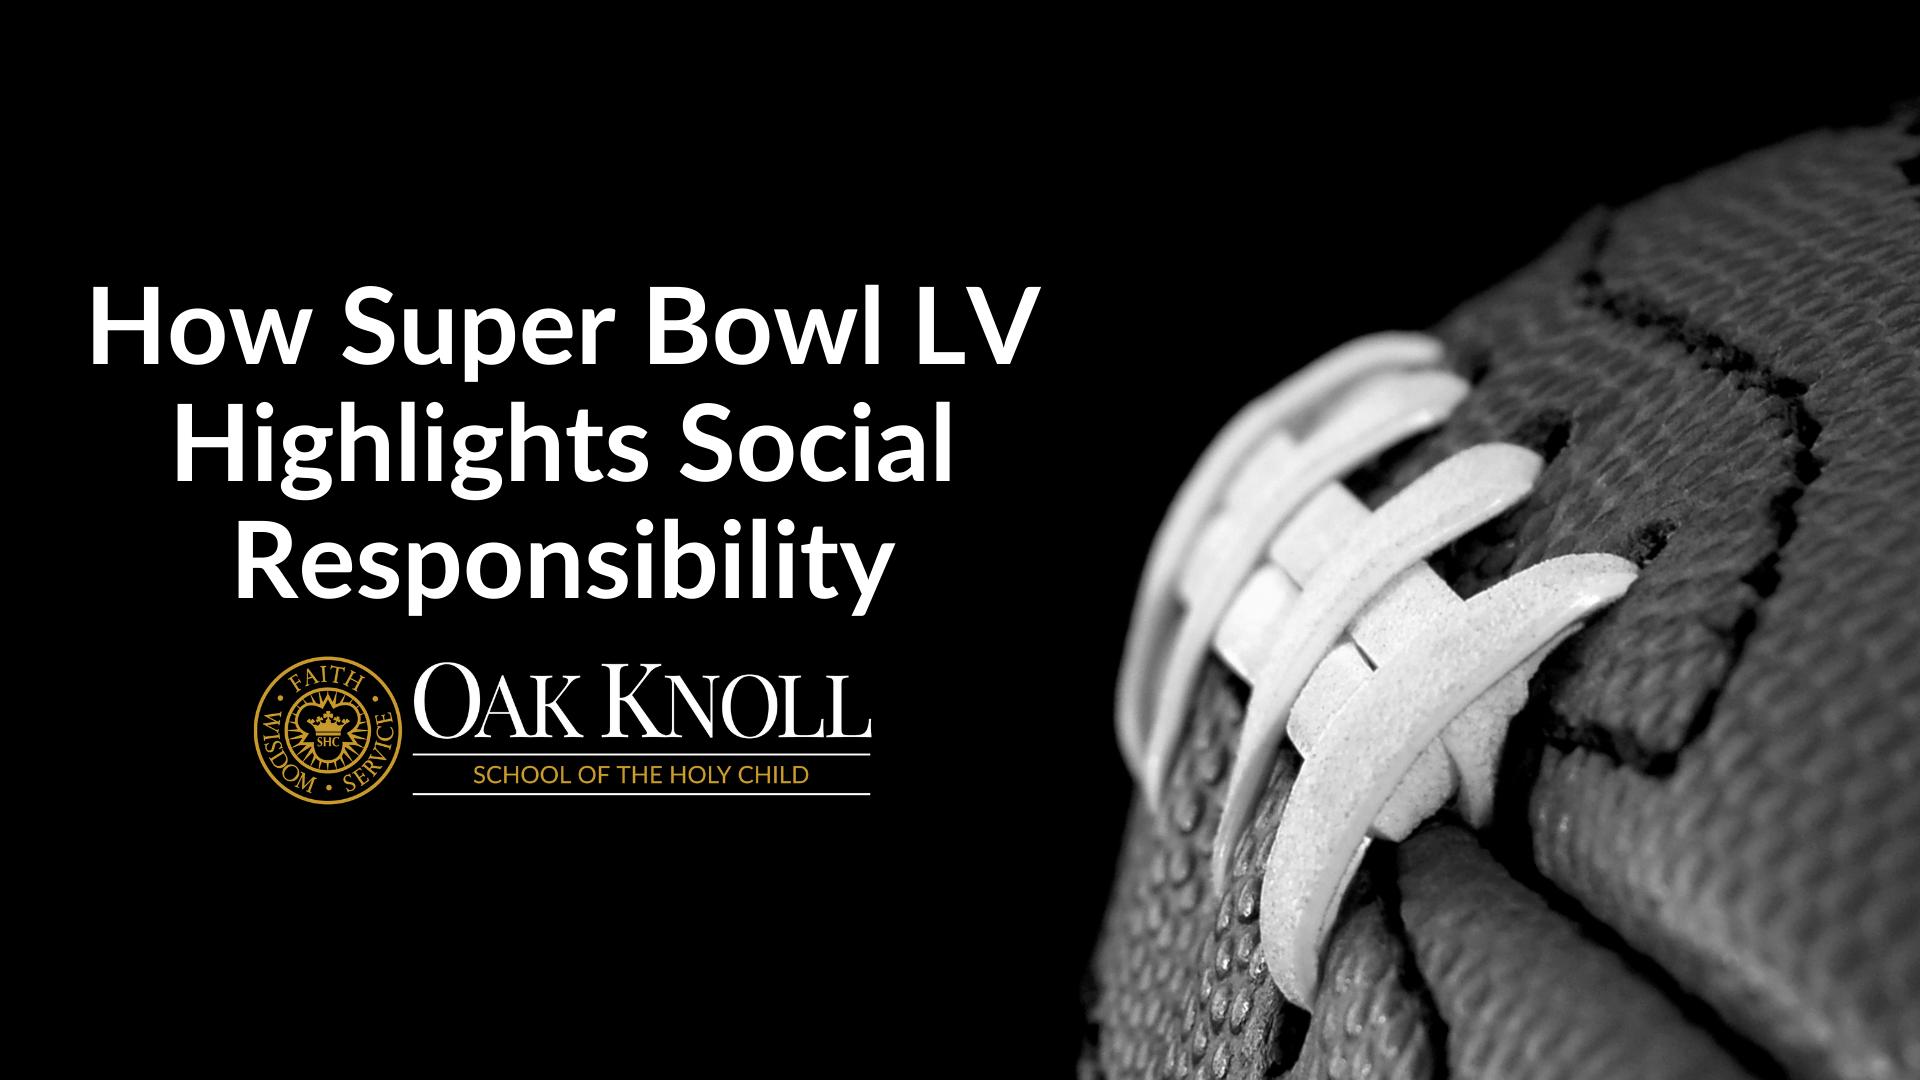 How Super Bowl LV Highlights Social Responsibility